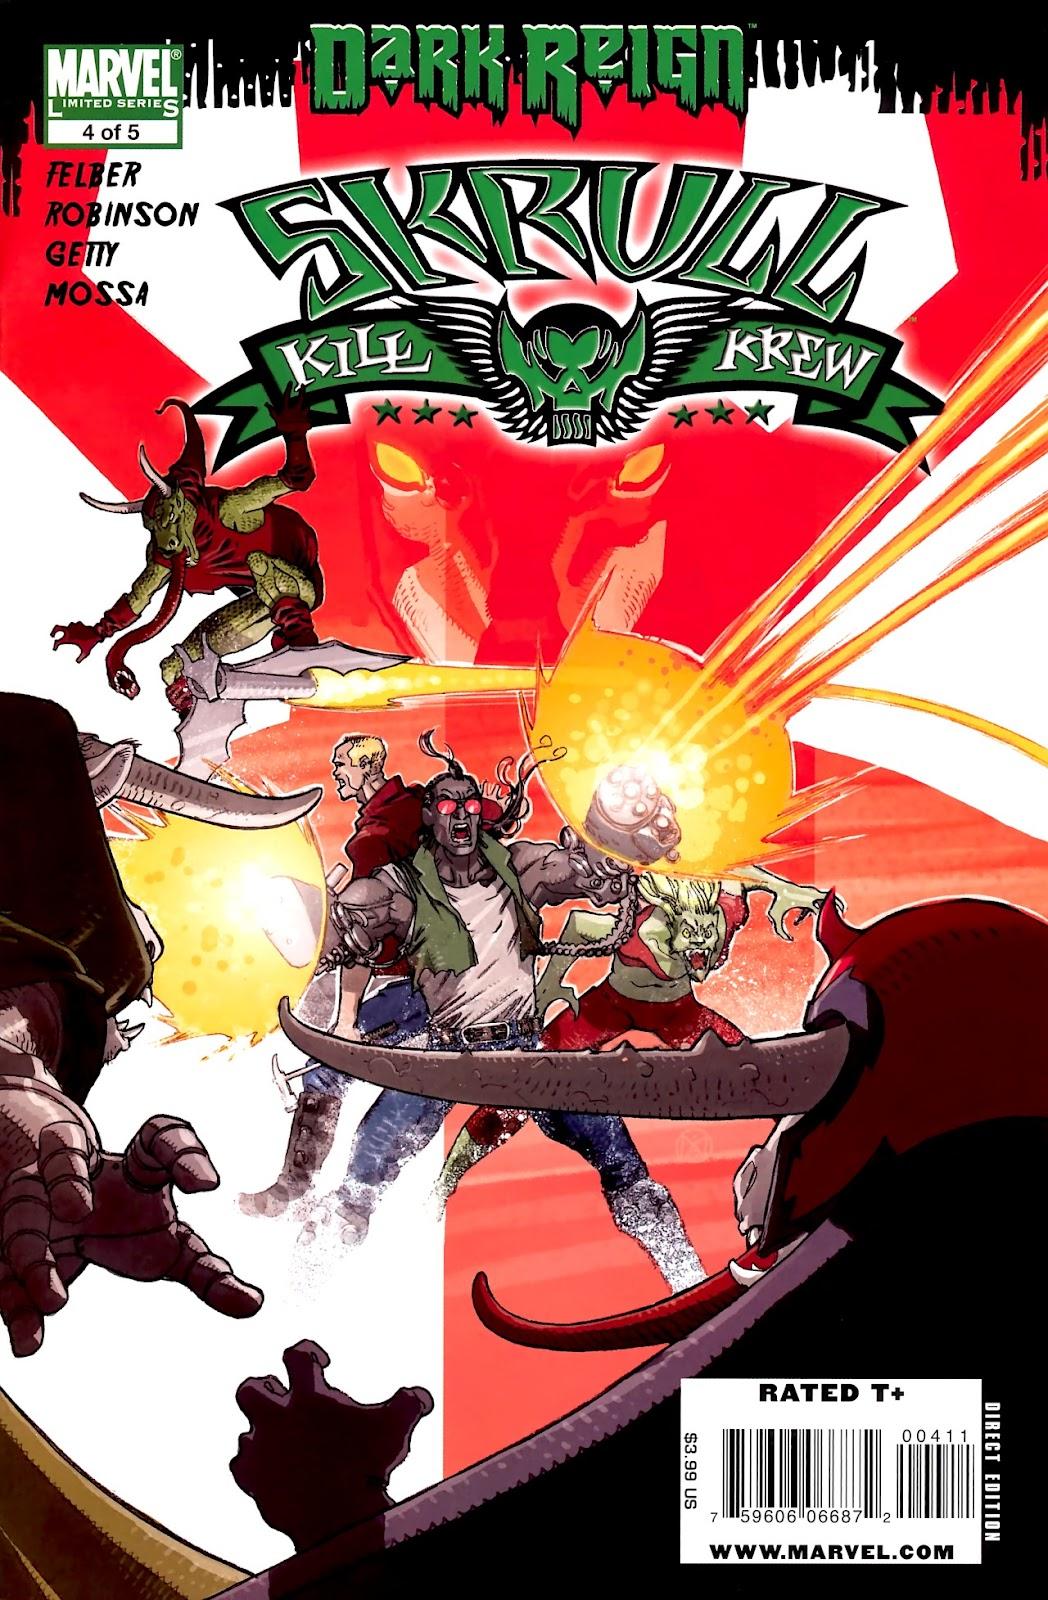 Skrull Kill Krew (2009) issue 4 - Page 1